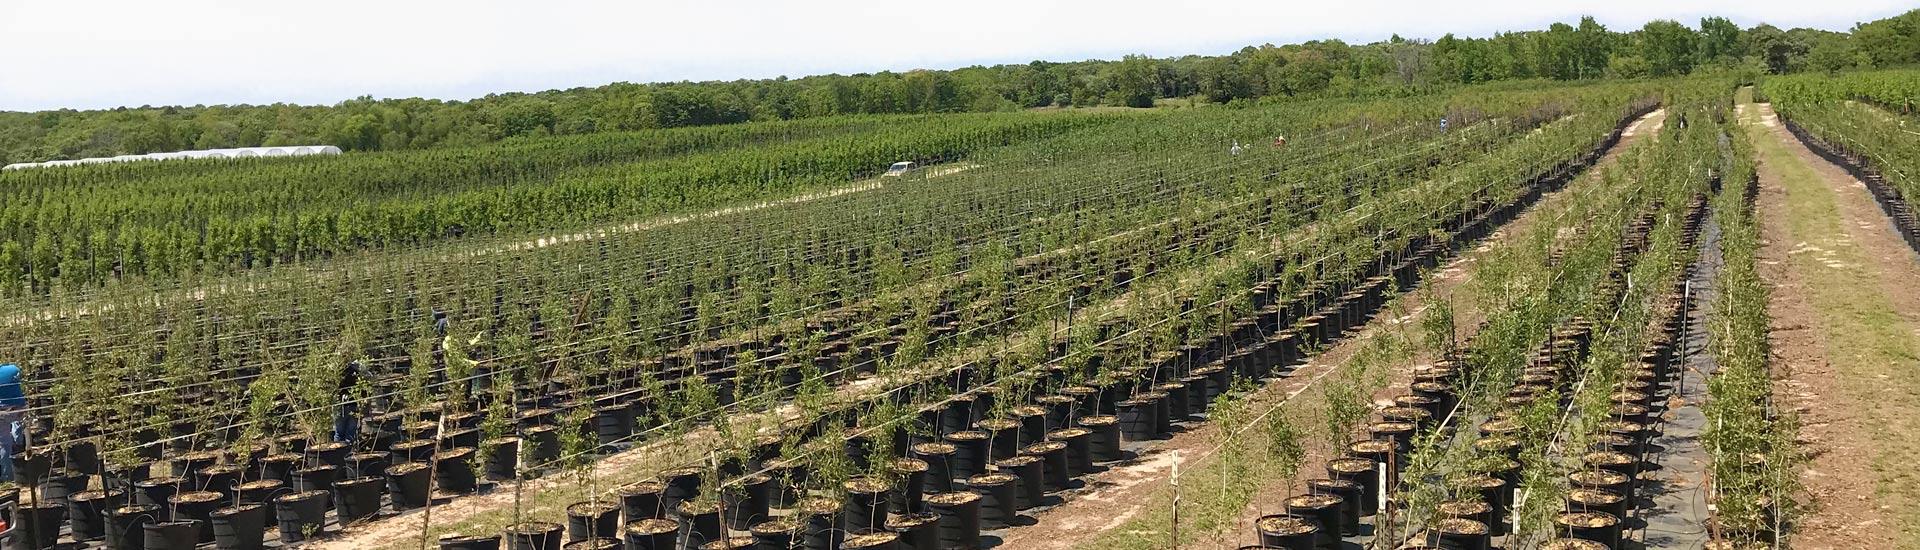 Athens Tree Farm - East Texas